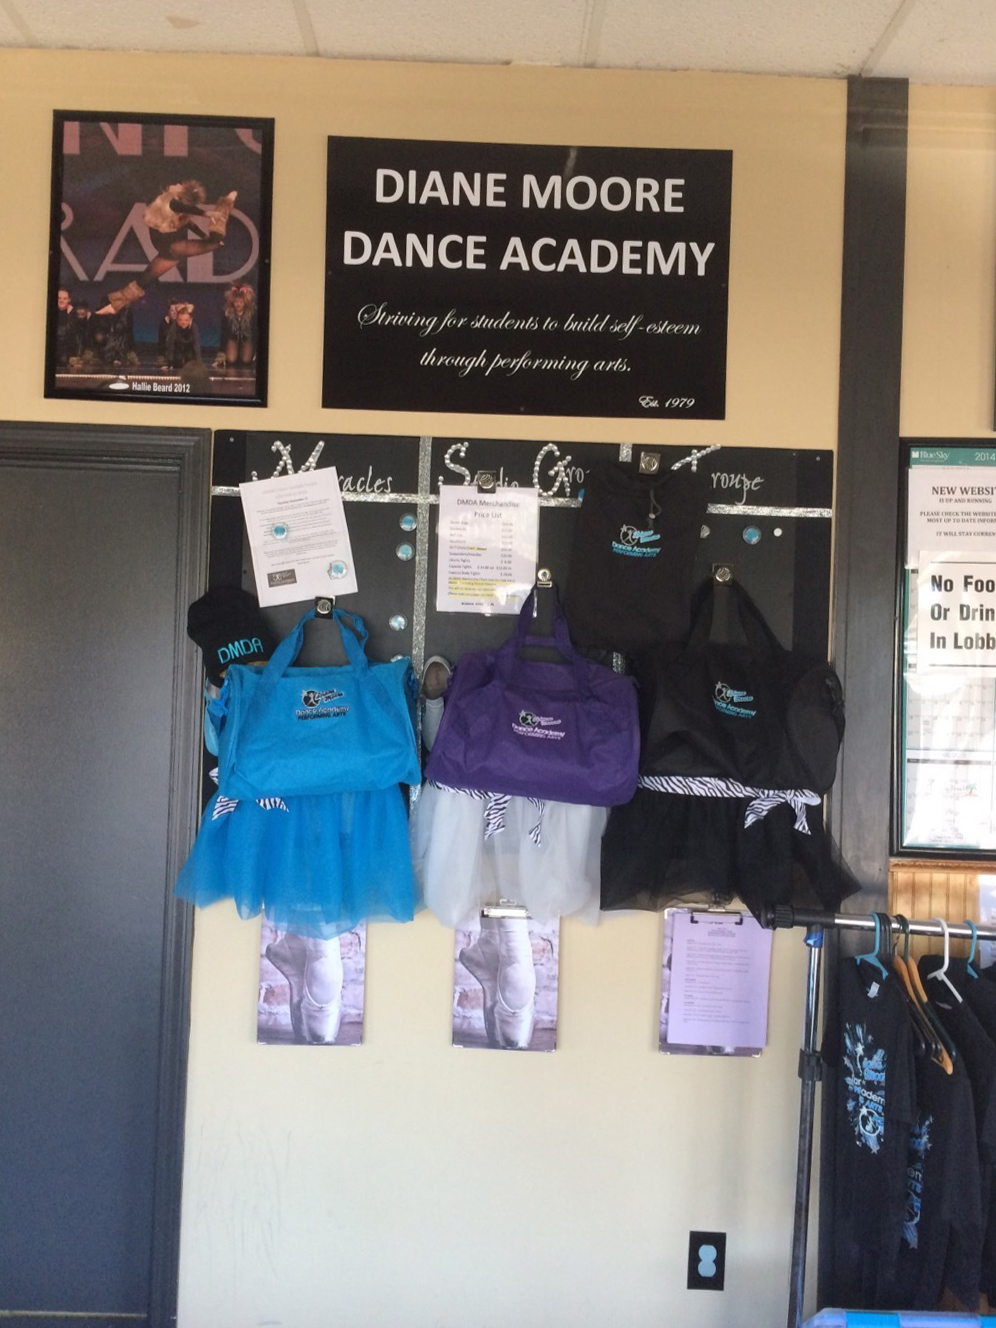 Diane Moore Dance Academy image 4